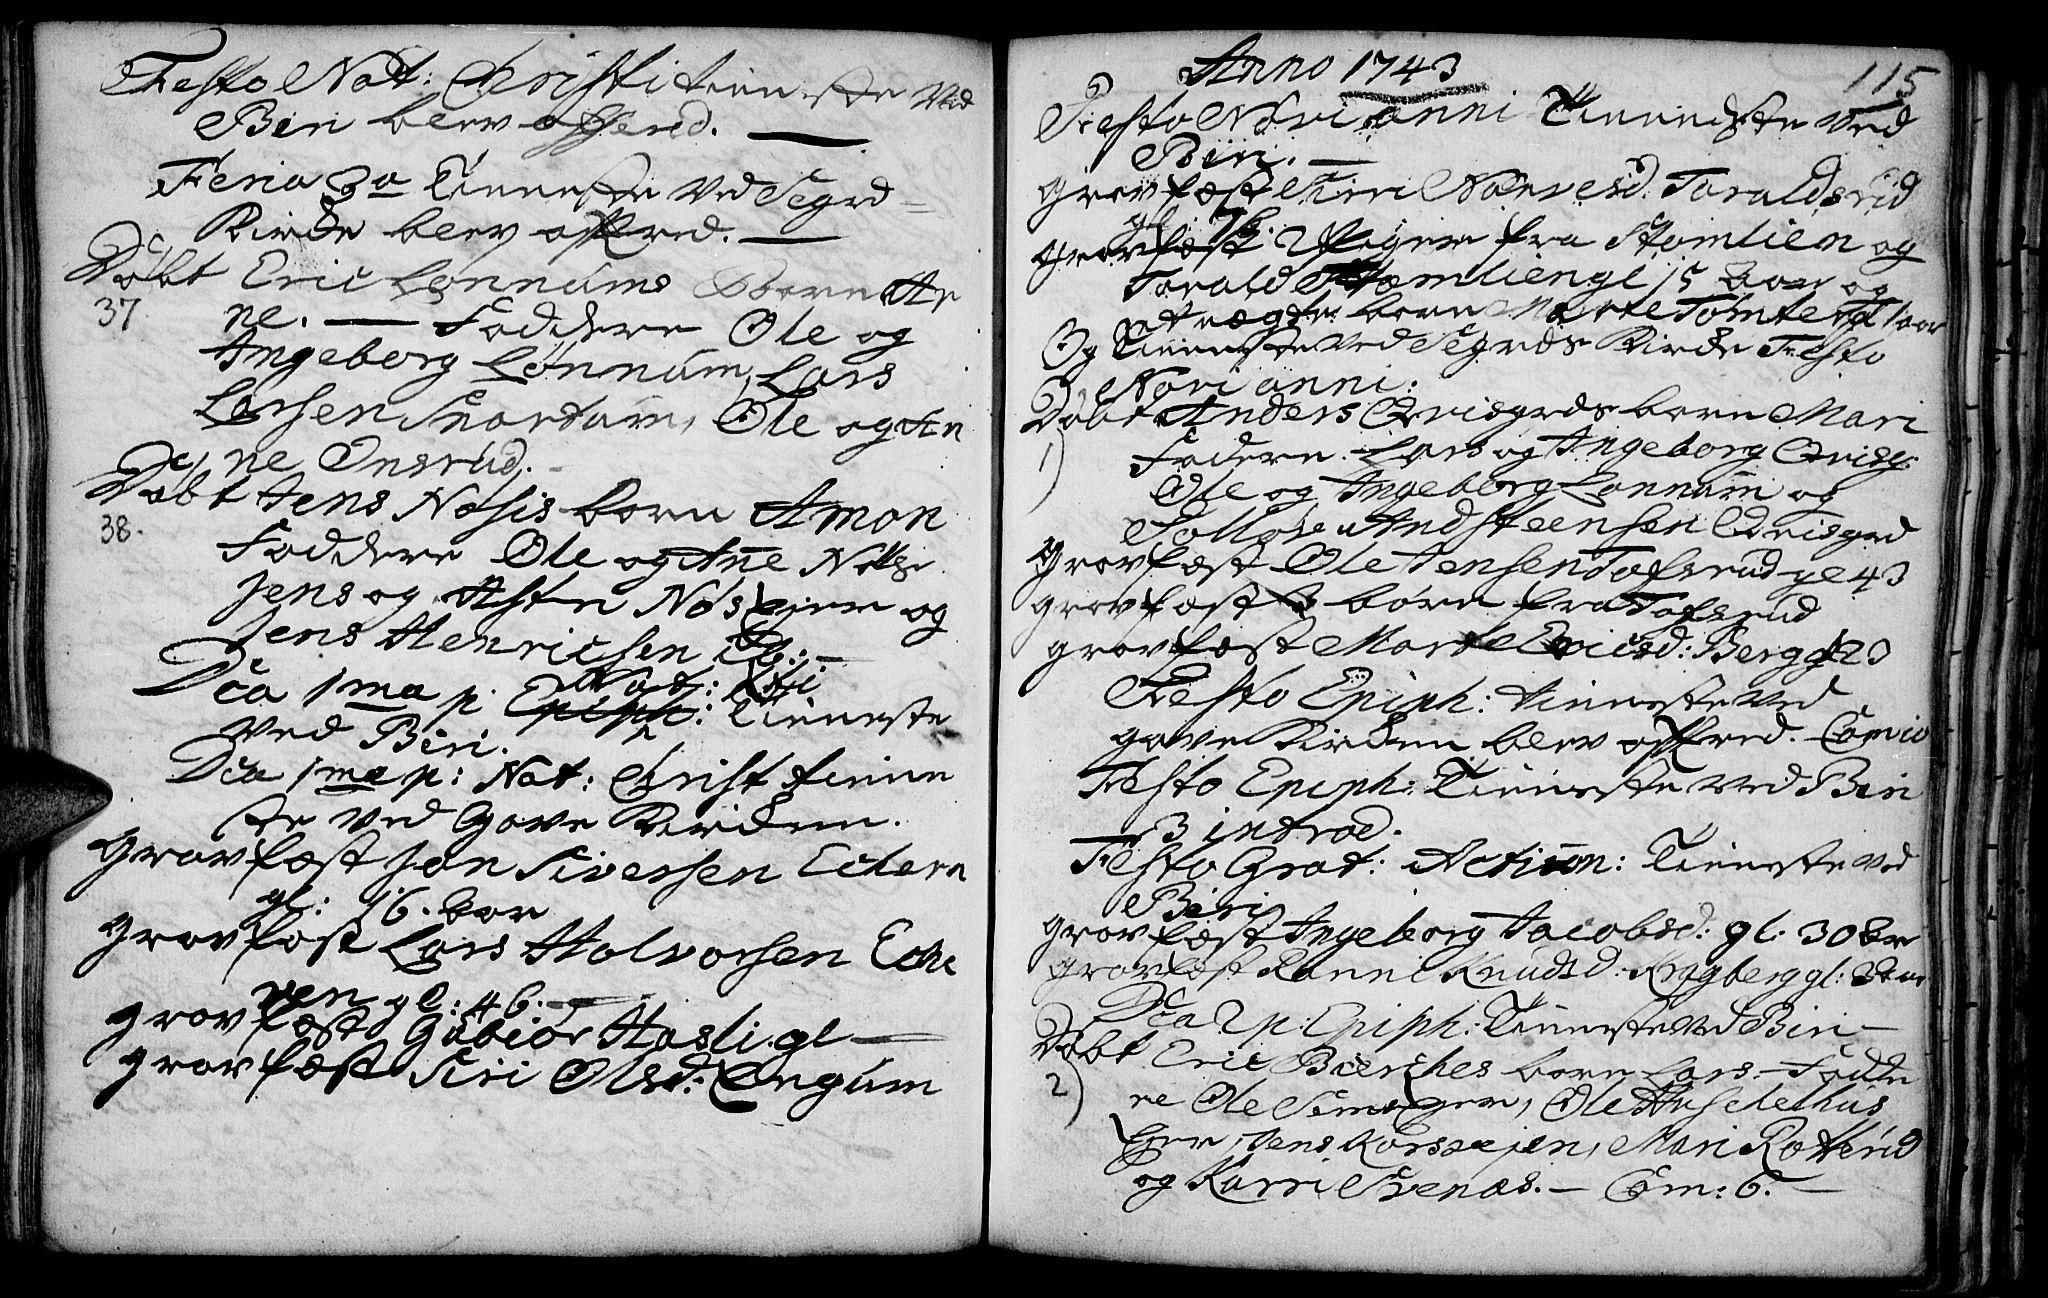 SAH, Biri prestekontor, Ministerialbok nr. 1, 1730-1754, s. 115